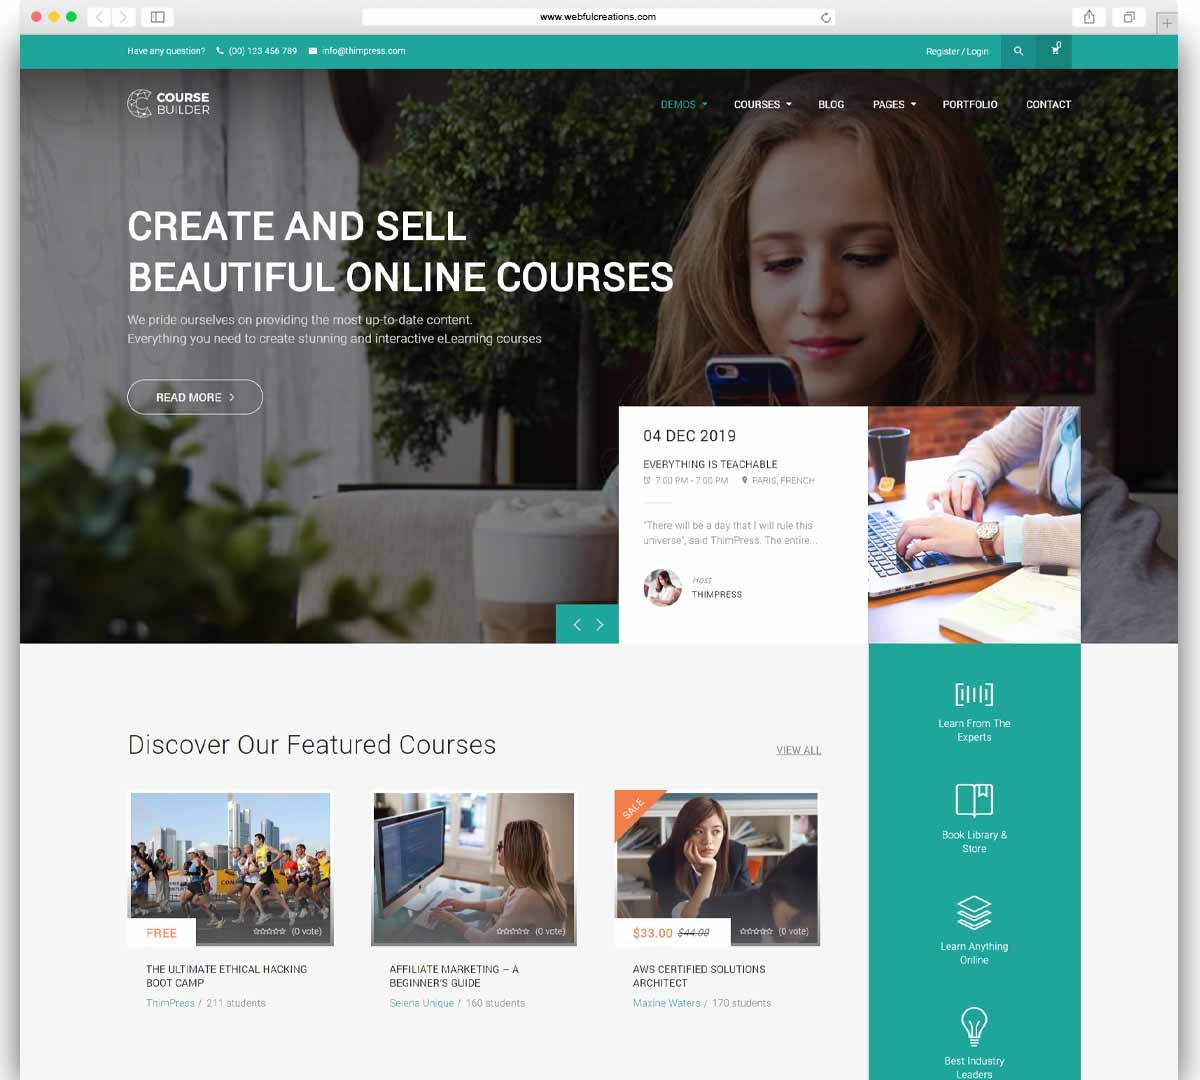 LMS WordPress Theme for Online Courses, Schools & Education